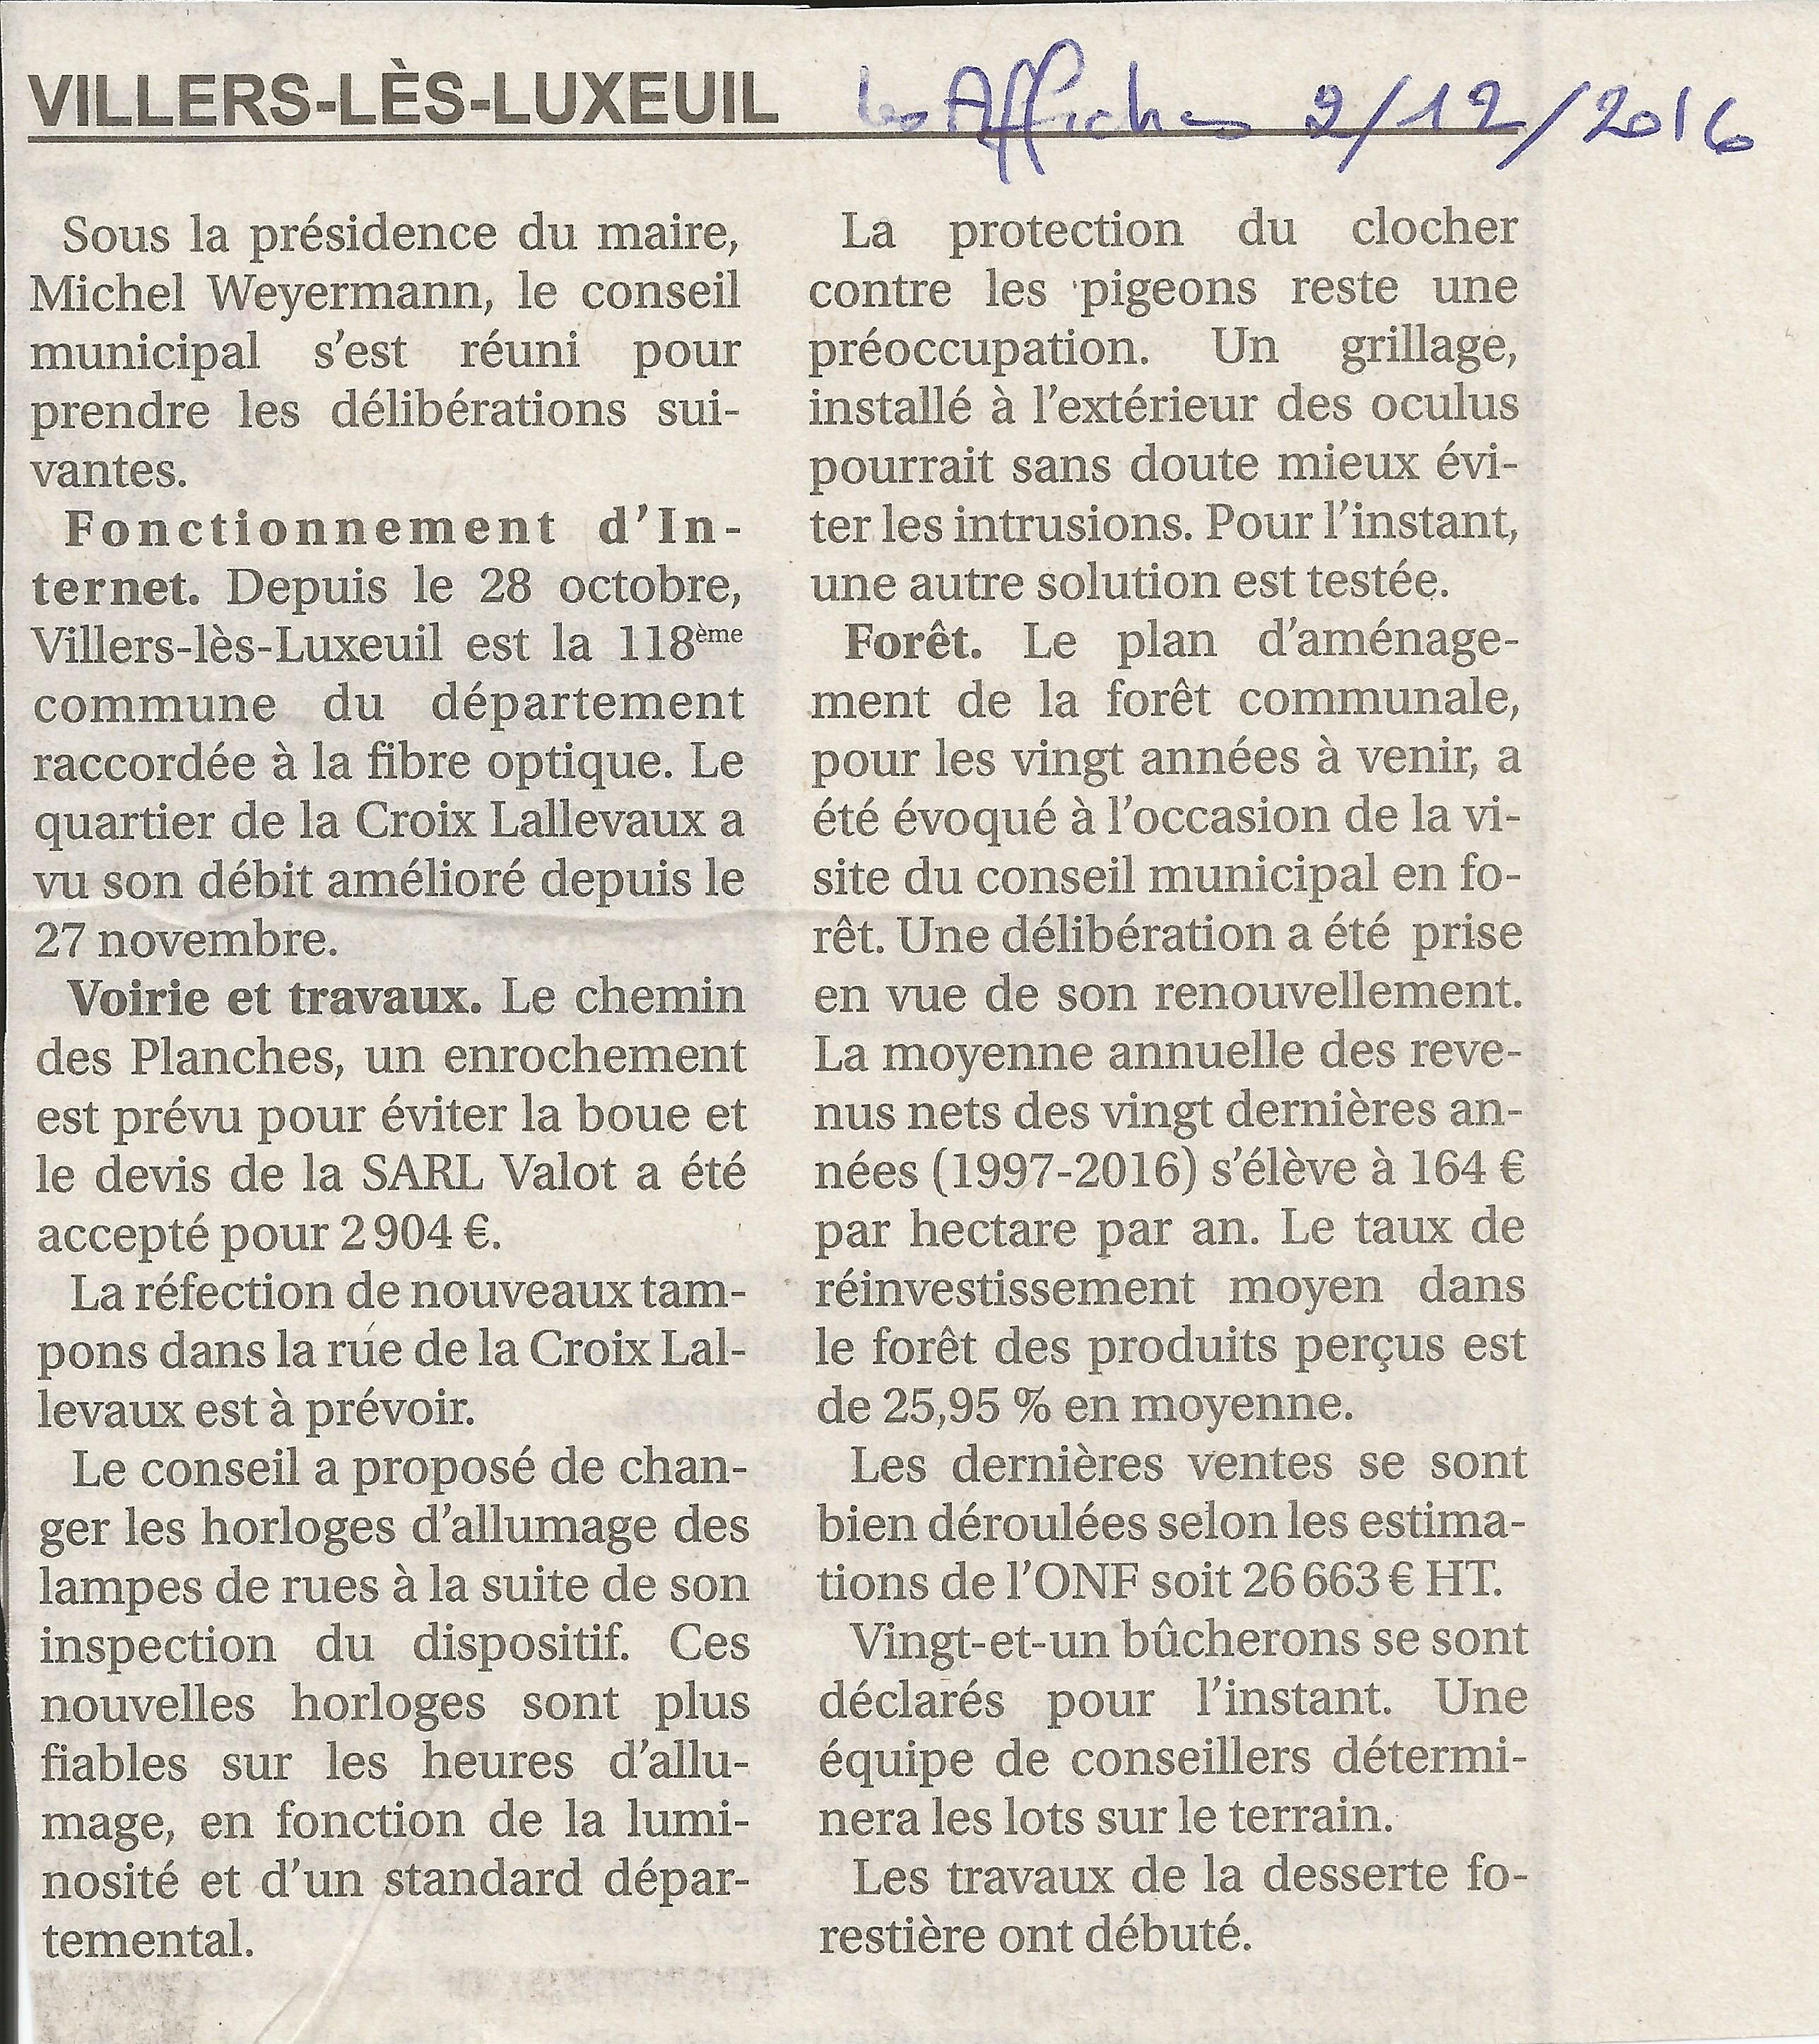 https://www.villers-les-luxeuil.com/projets/villers/files/images/2016_Mairie/Presse/2016_12_02.jpg